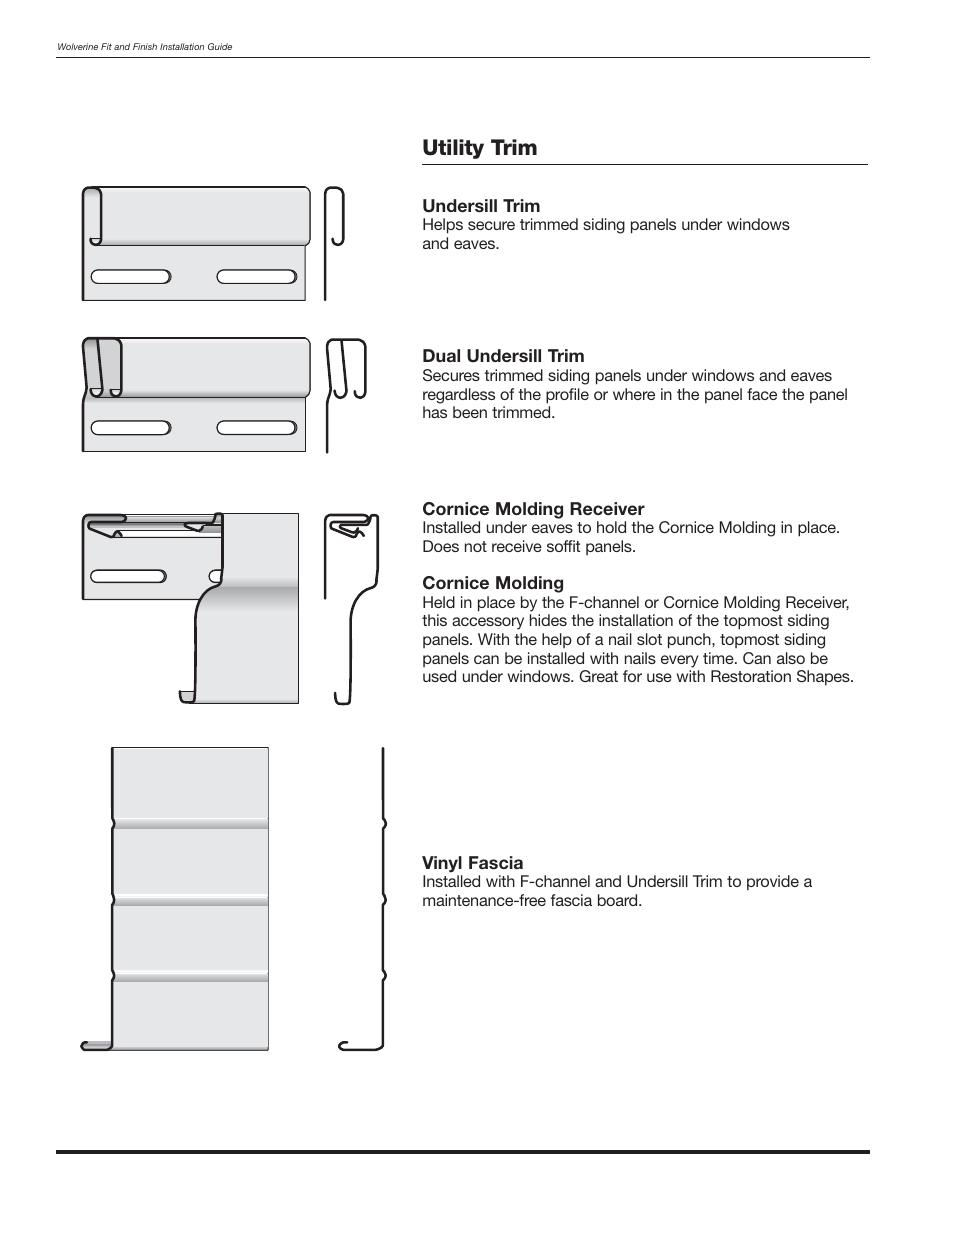 Utility trim | Wolverine Siding and Vinyl Carpentry Soffit